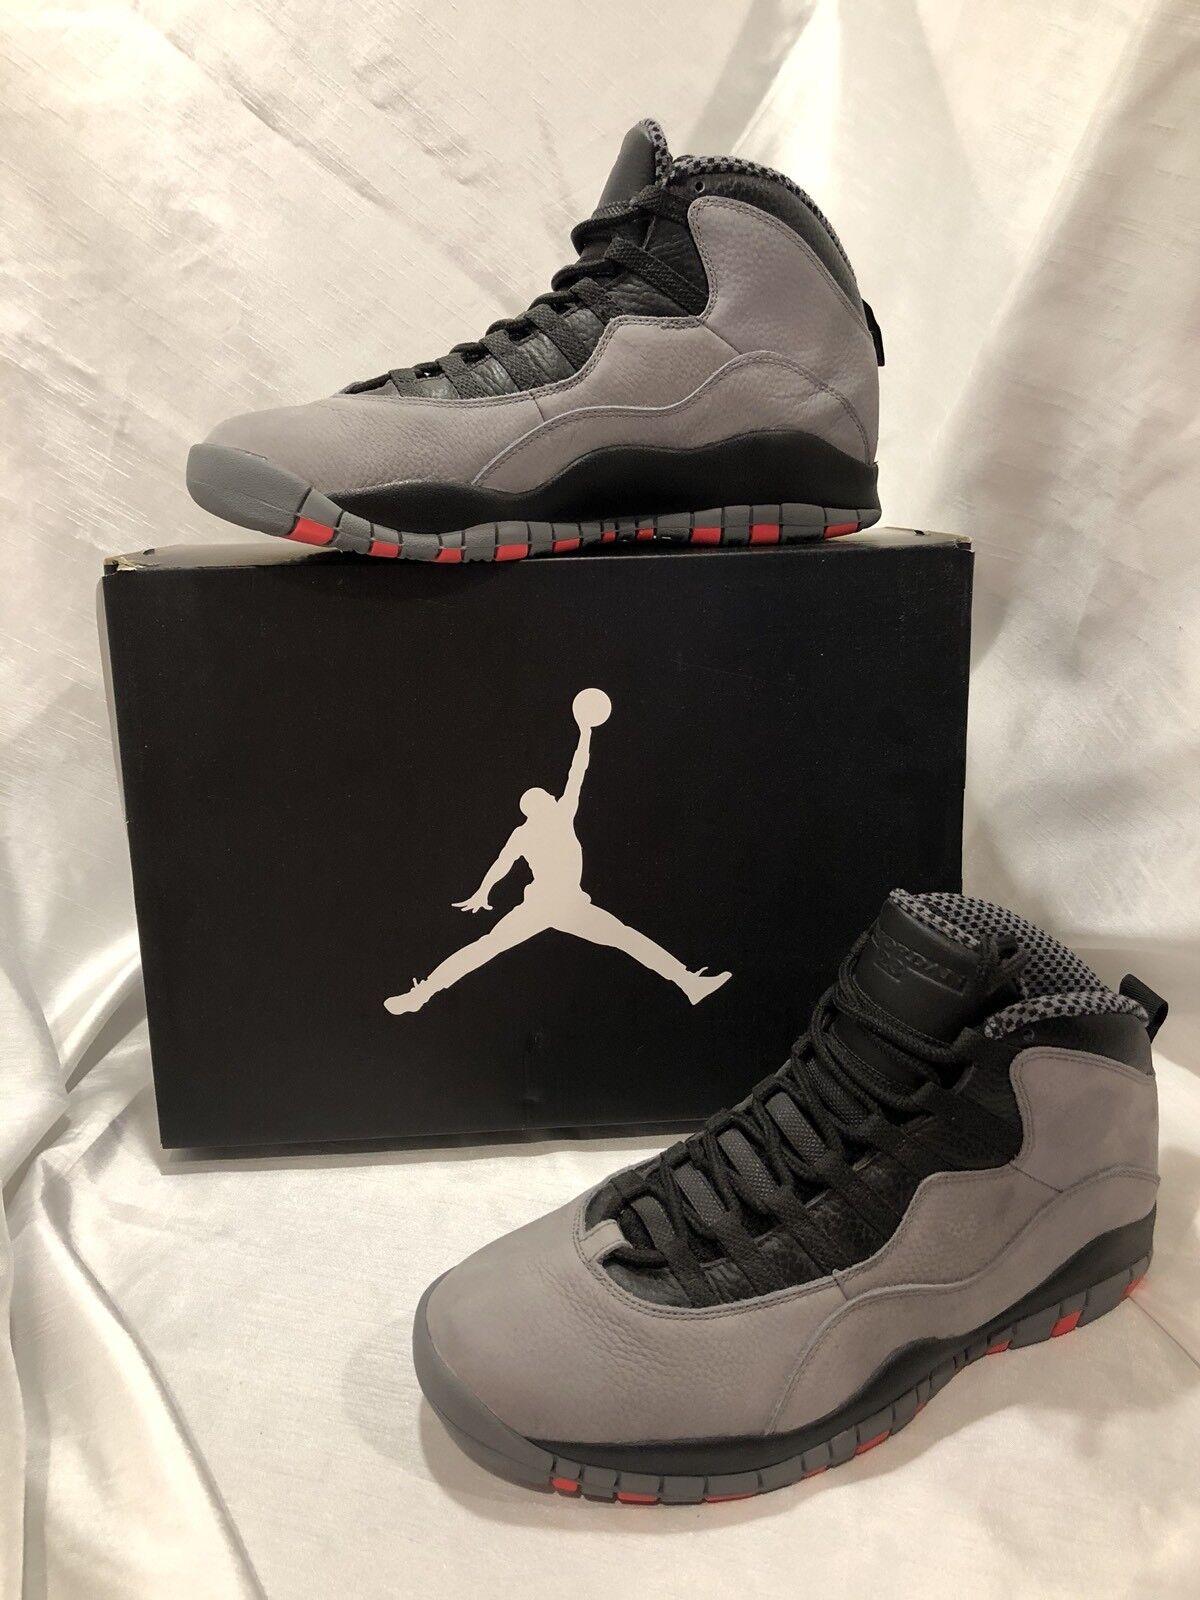 Mens Air Jordan 10 Retro Size 11 Black Gray